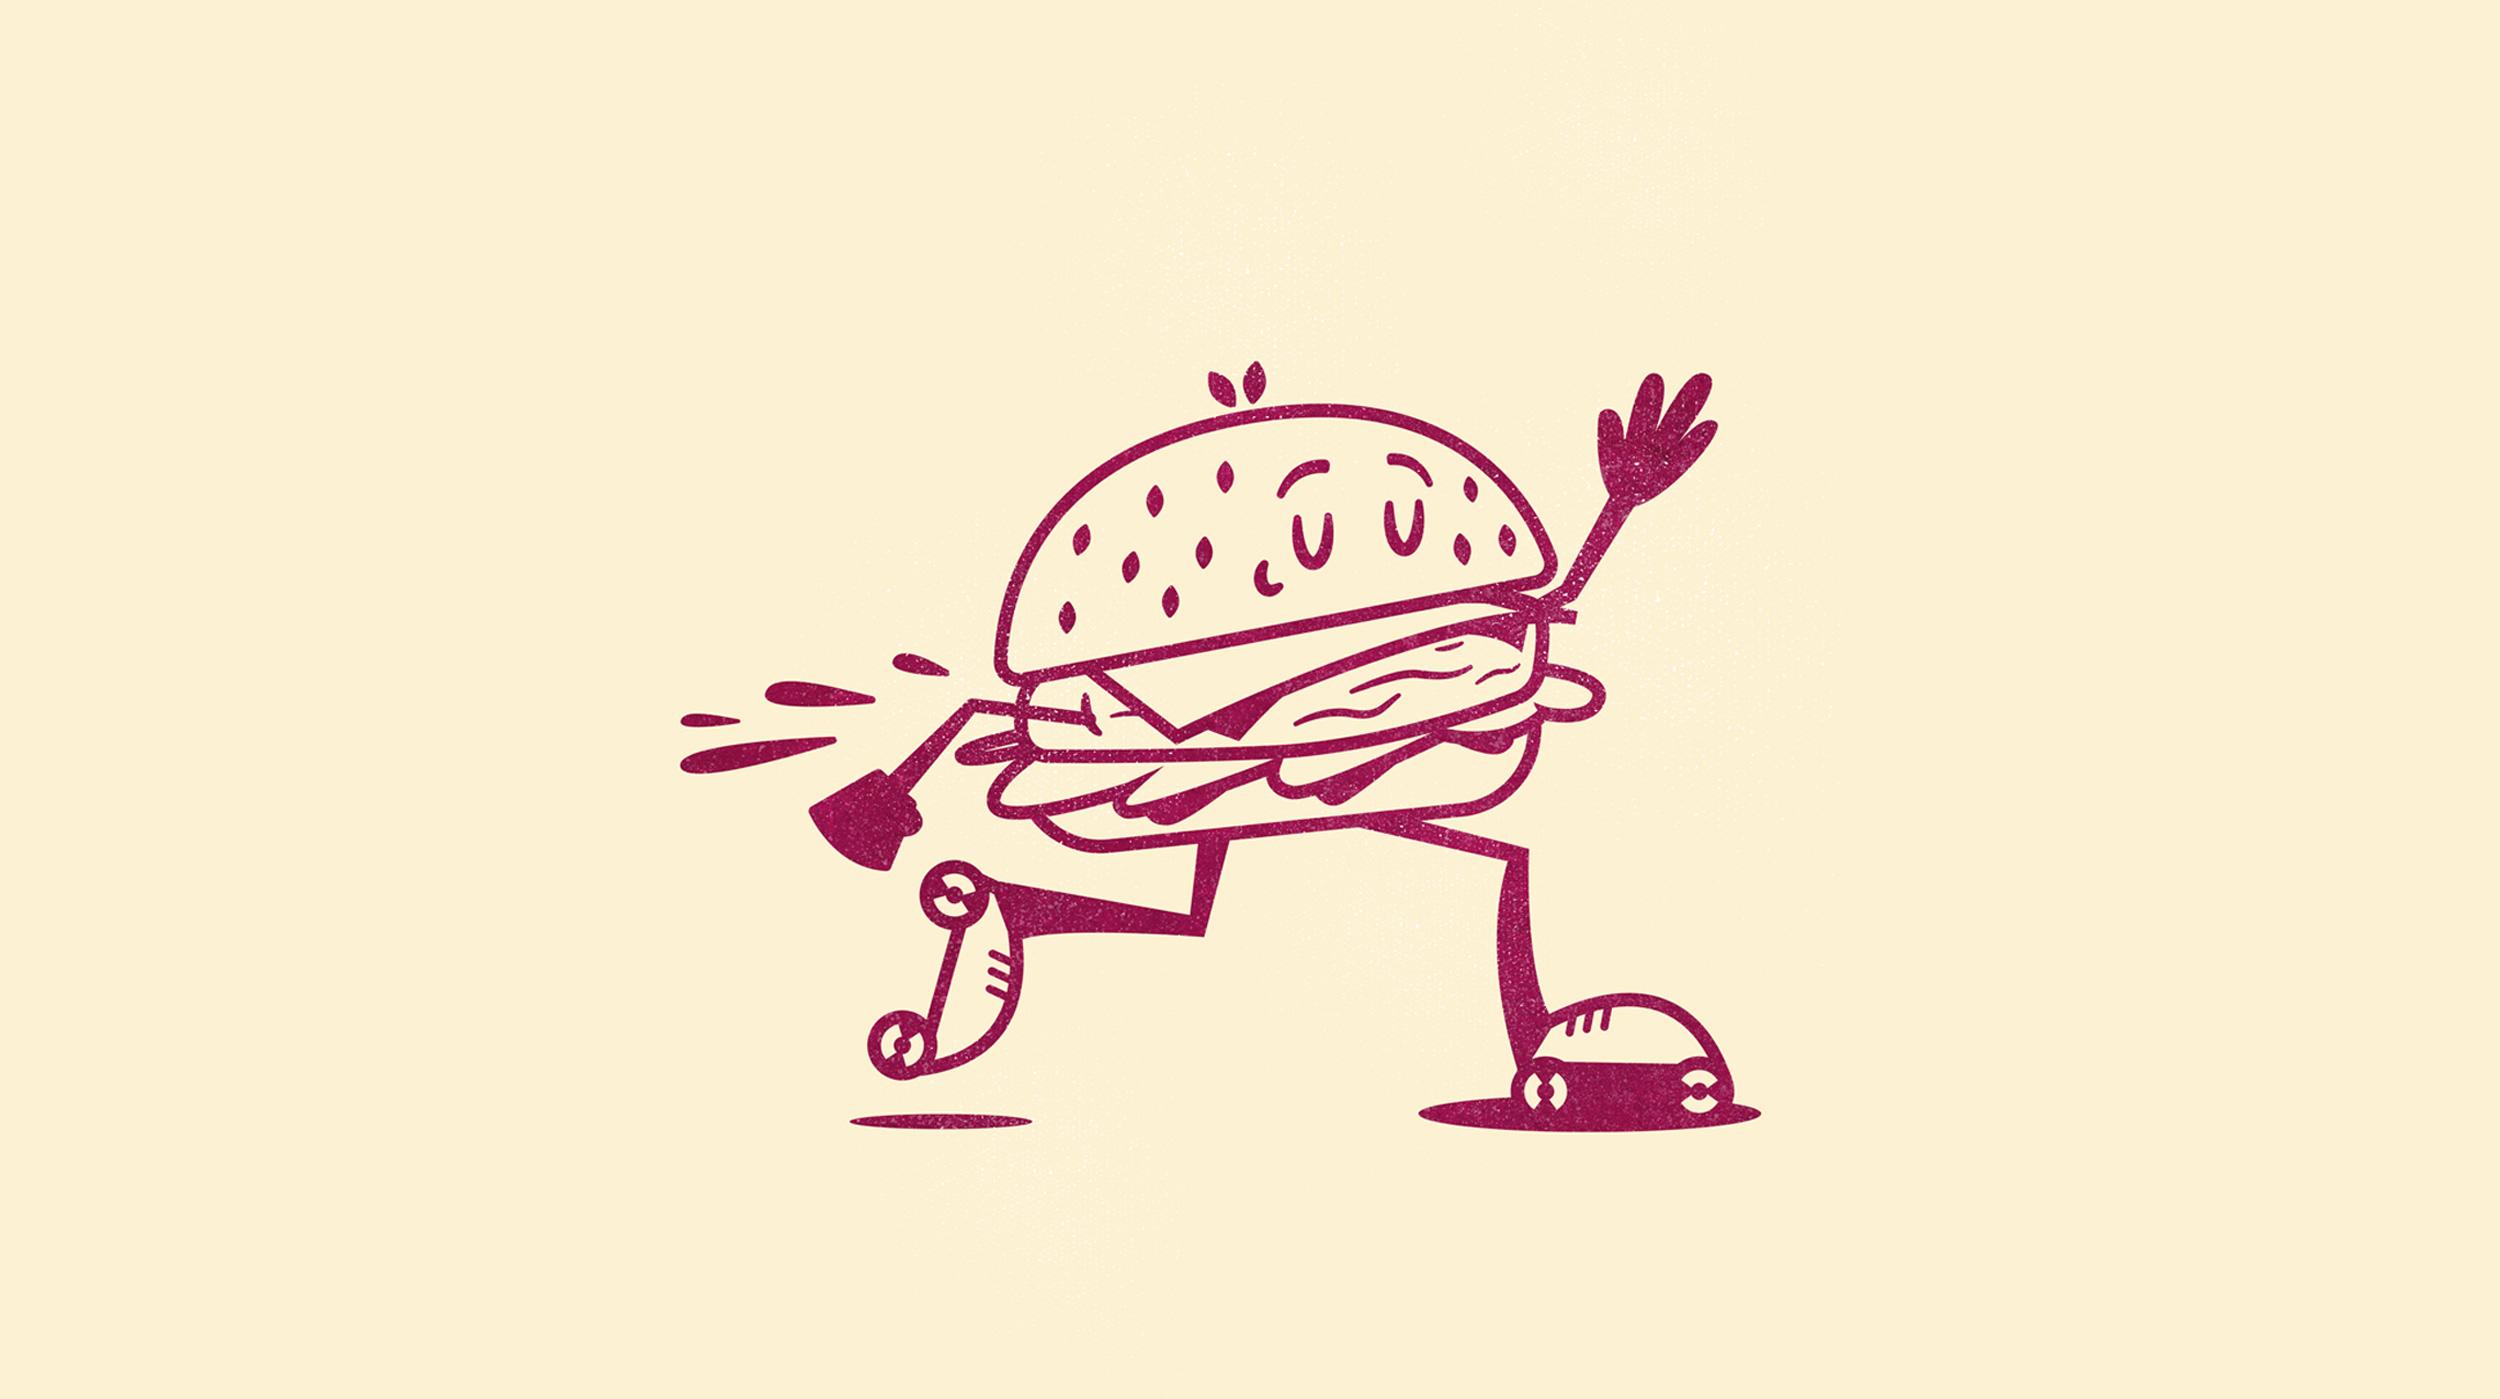 Eat-Goshen_Visuals_c2